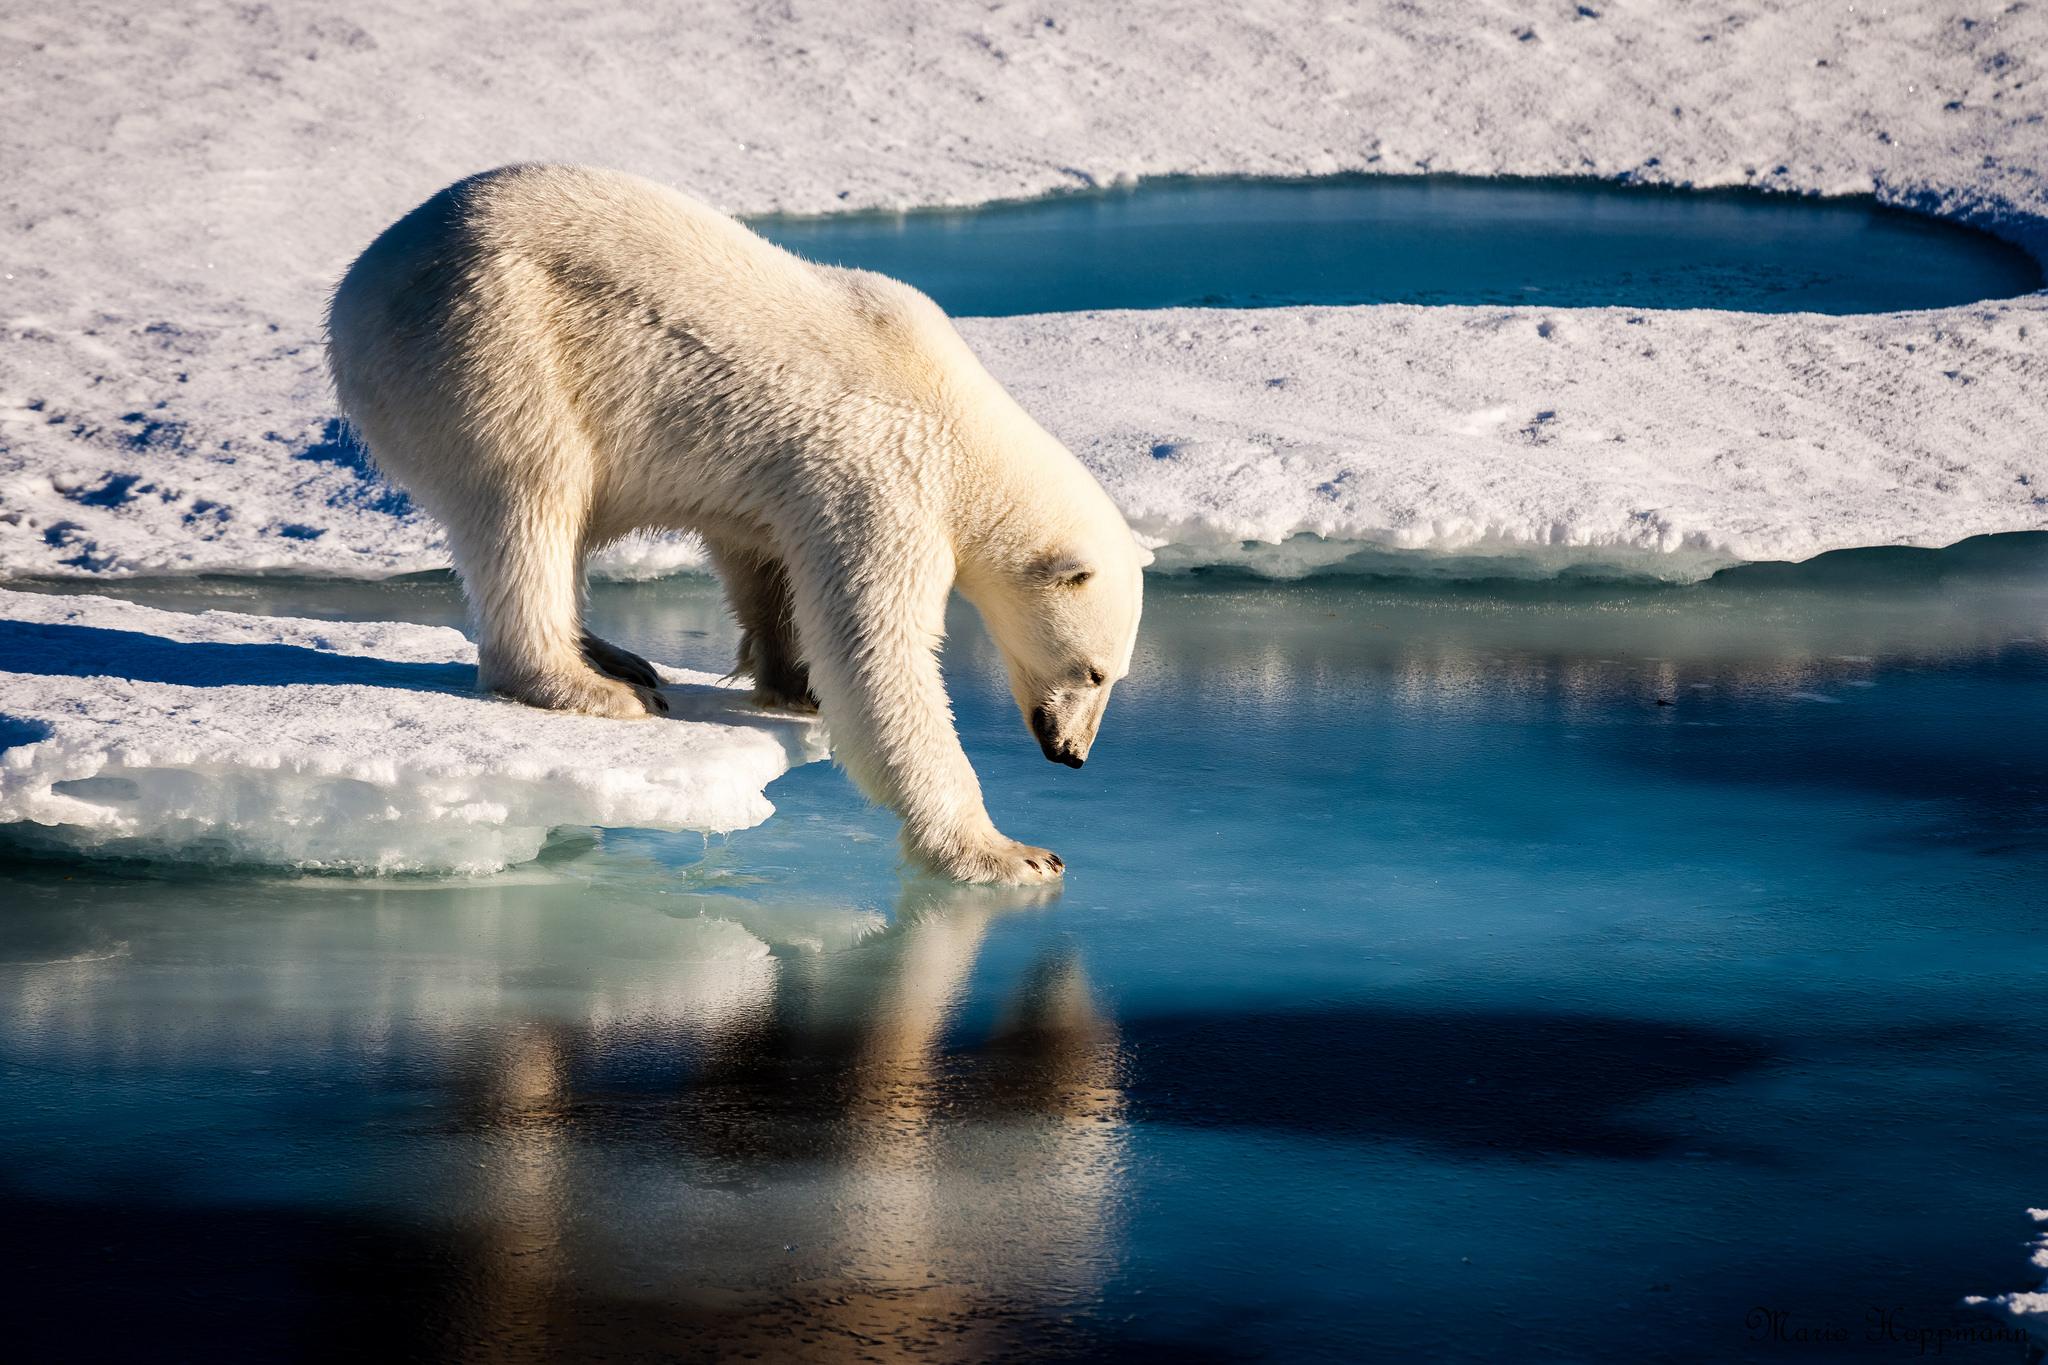 Bearing teeth: How polar bear dental health can illustrate climate change